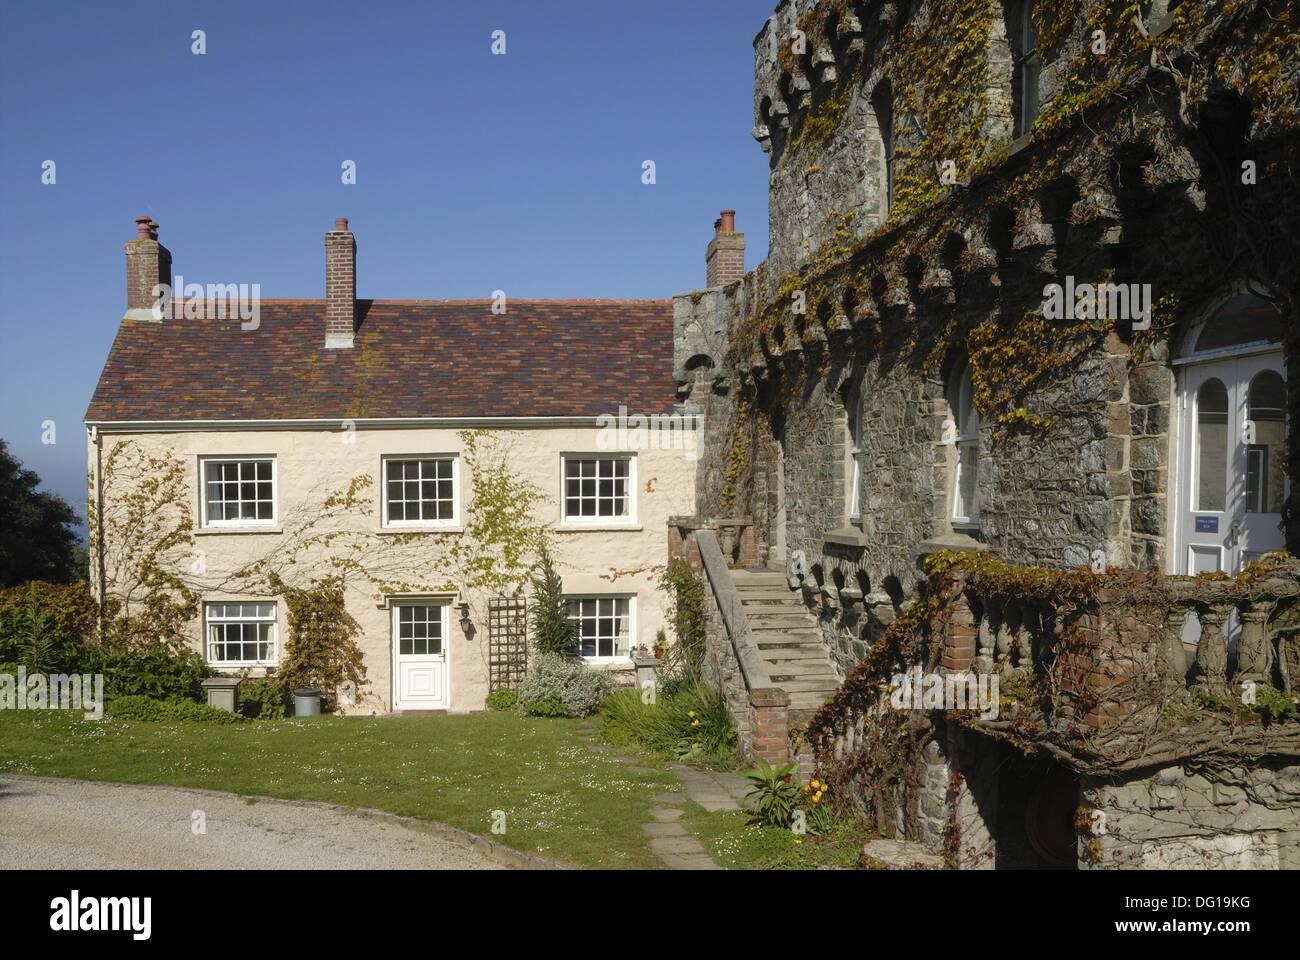 Bailiff´s House, Herm Island, Bailiwick Of Guernsey, British Crown  Dependency, English Channel, Atlantic Ocean, Europe